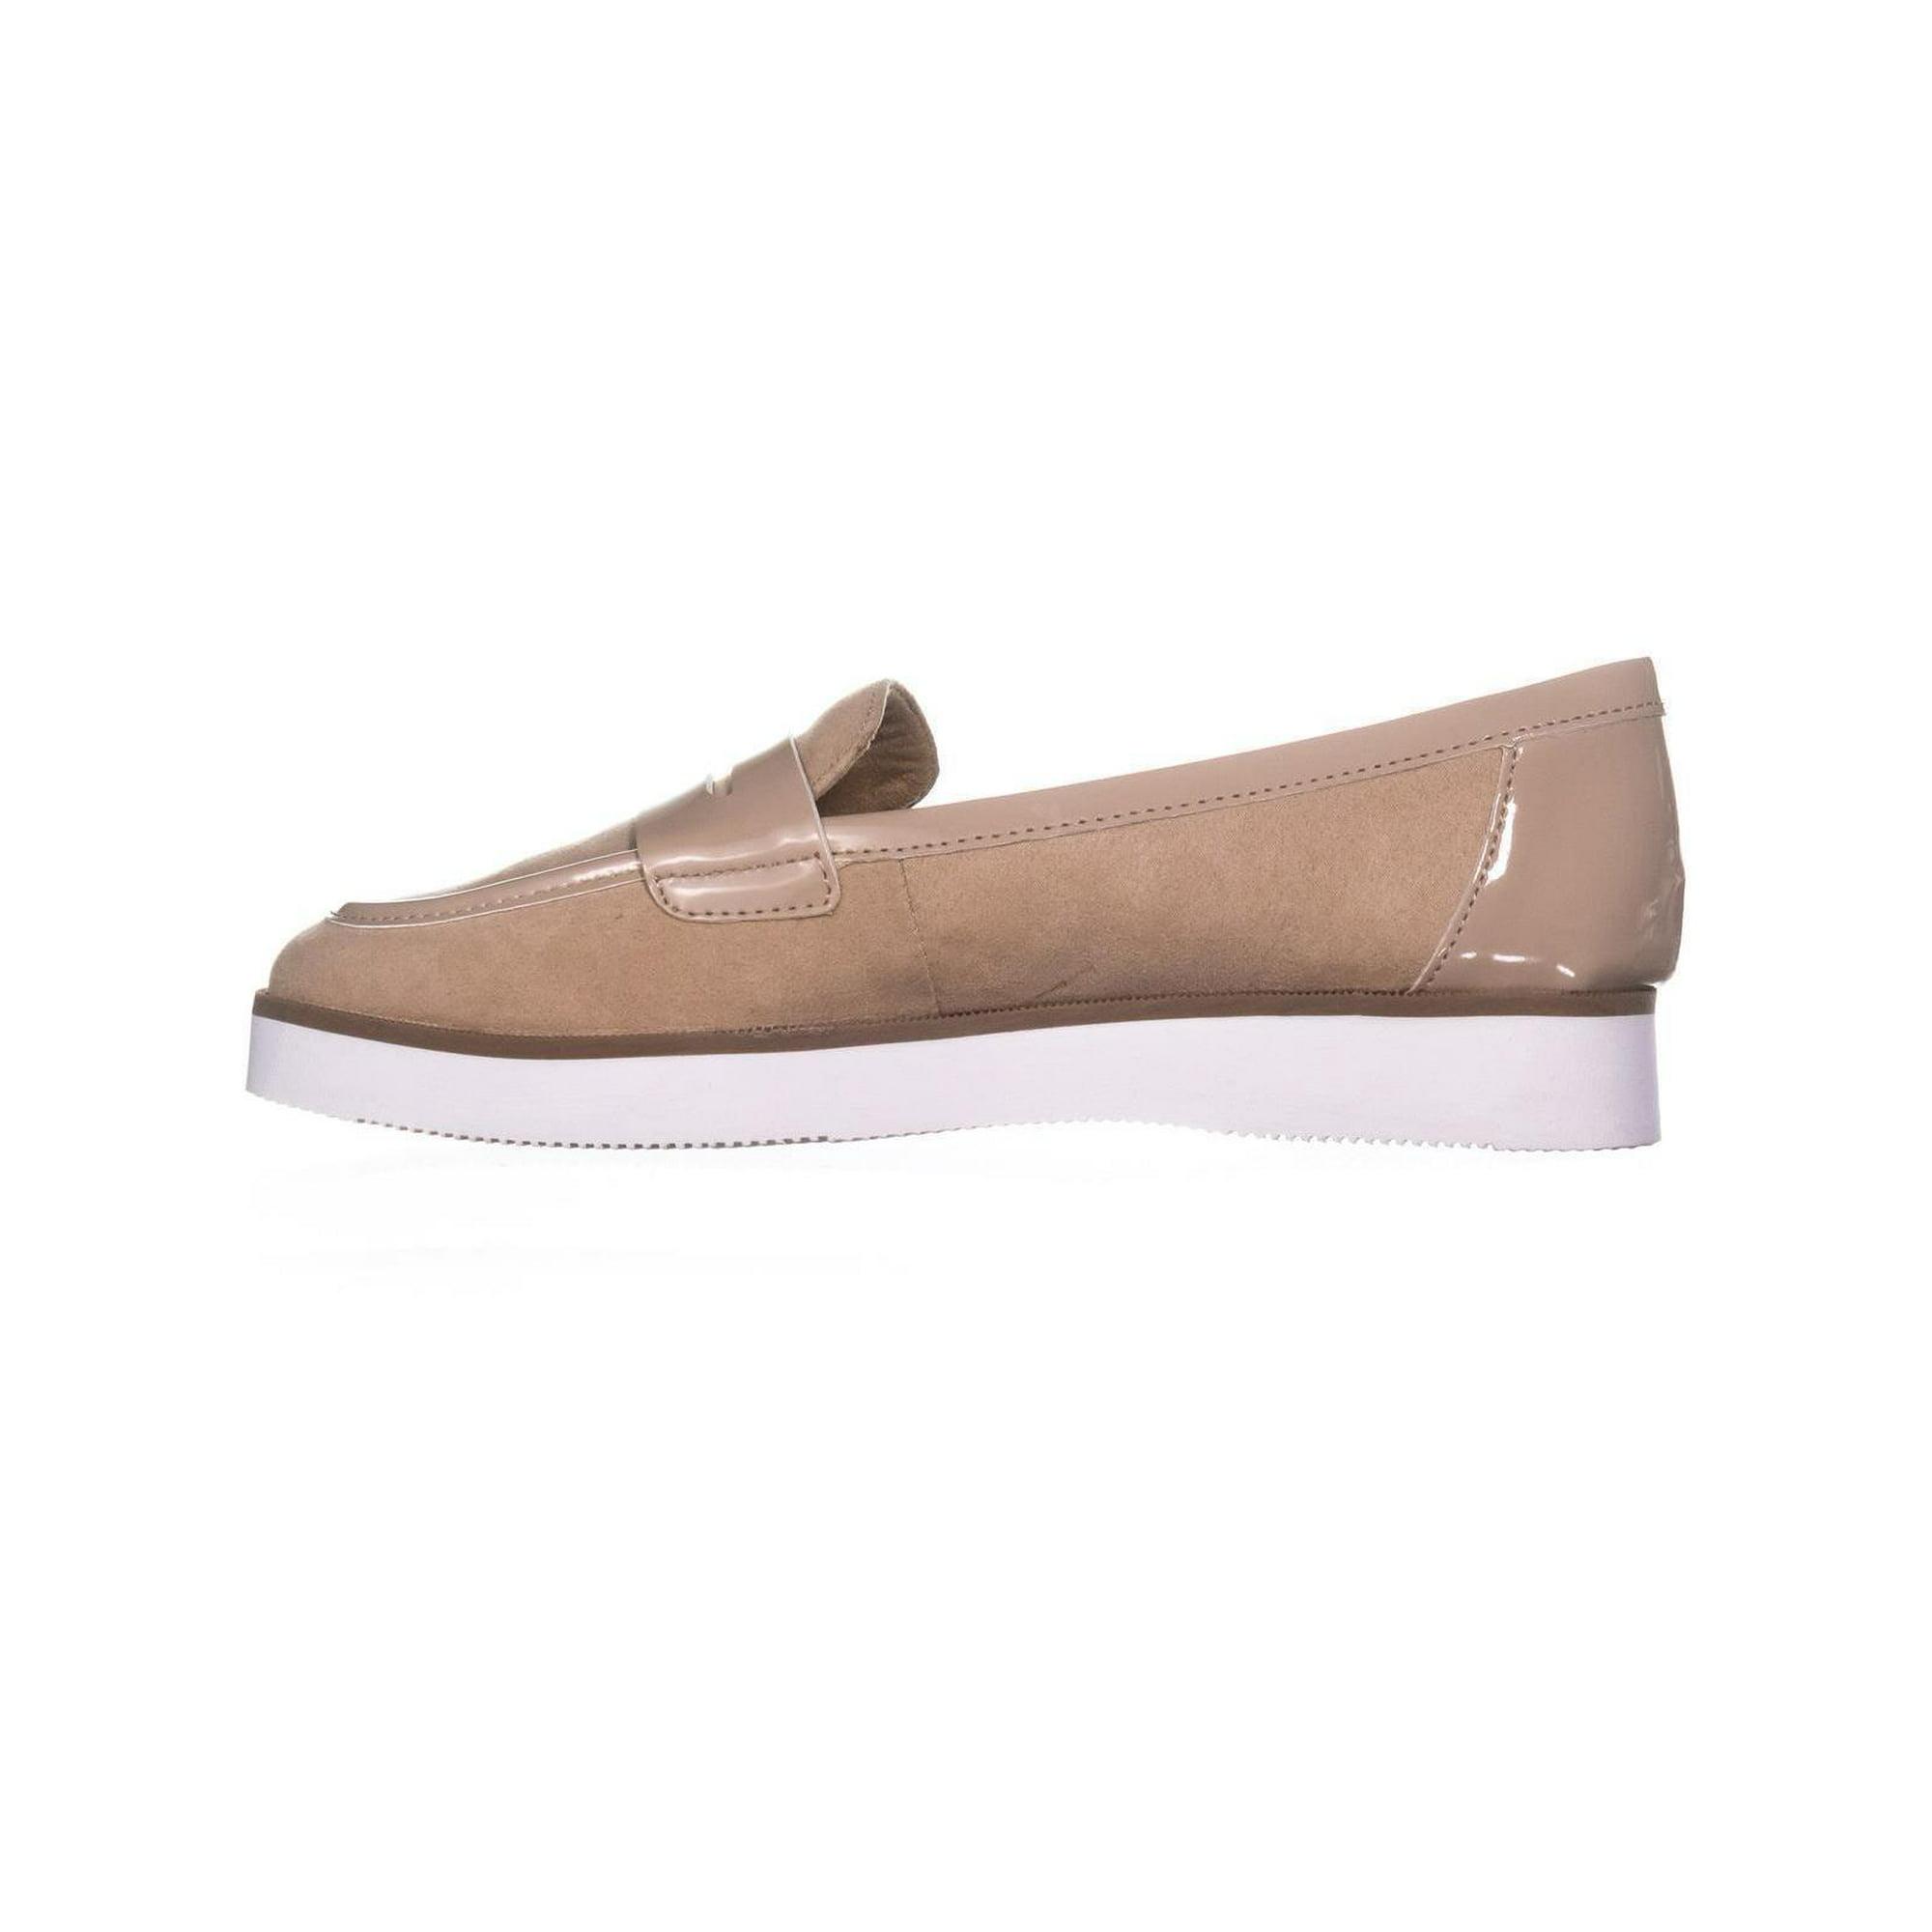 67962f7384e Naturalizer Womens Zoren Fabric Closed Toe Loafers